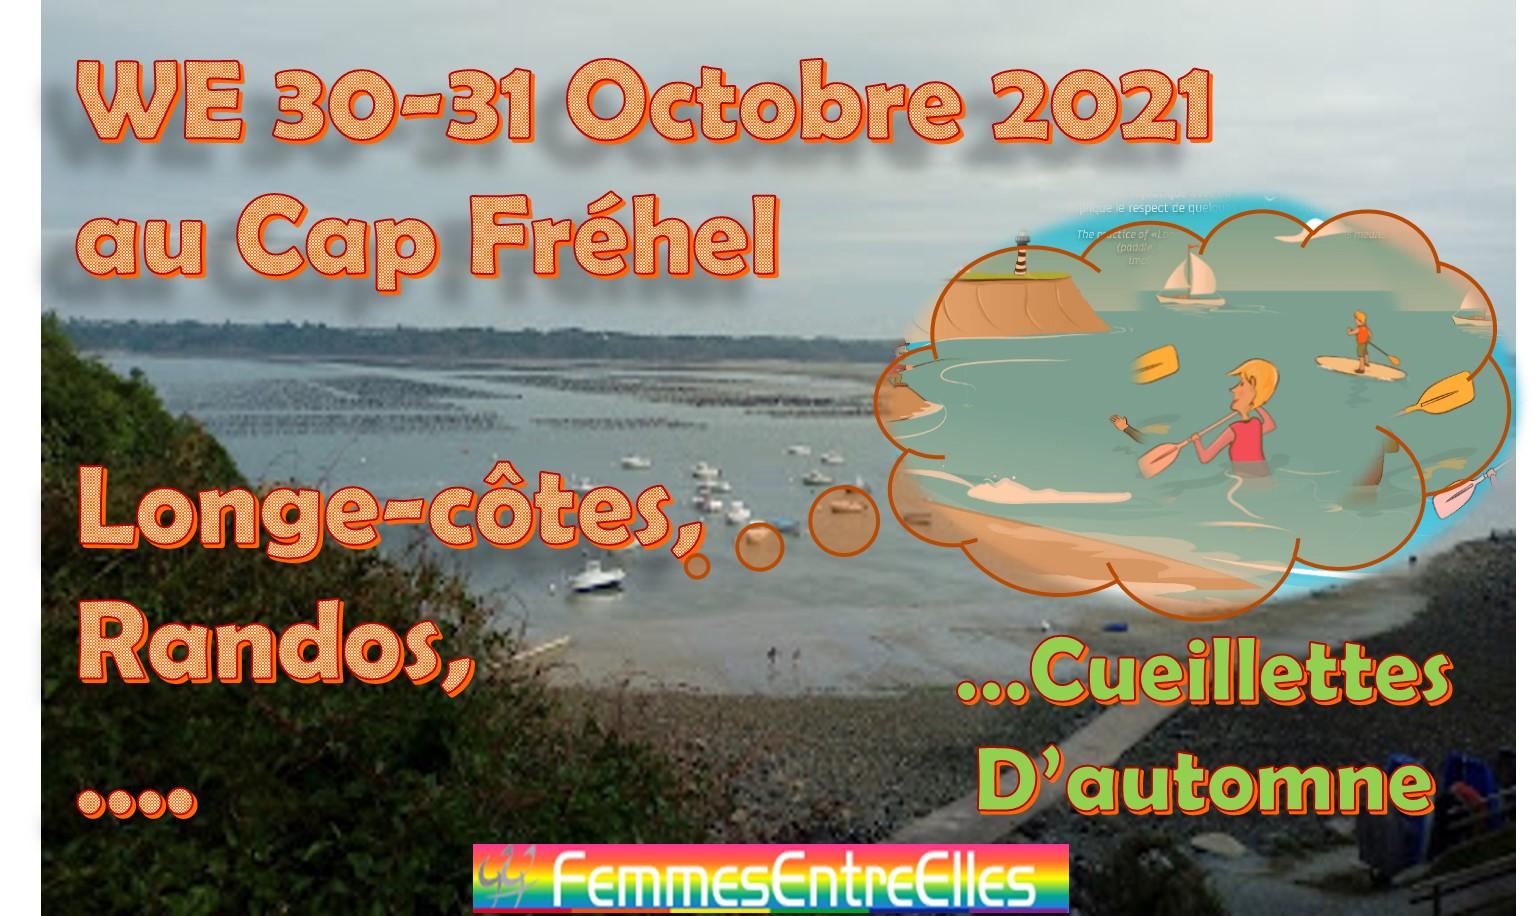 WE FEE  30-31 Octobre 2021 au Cap Fréhel